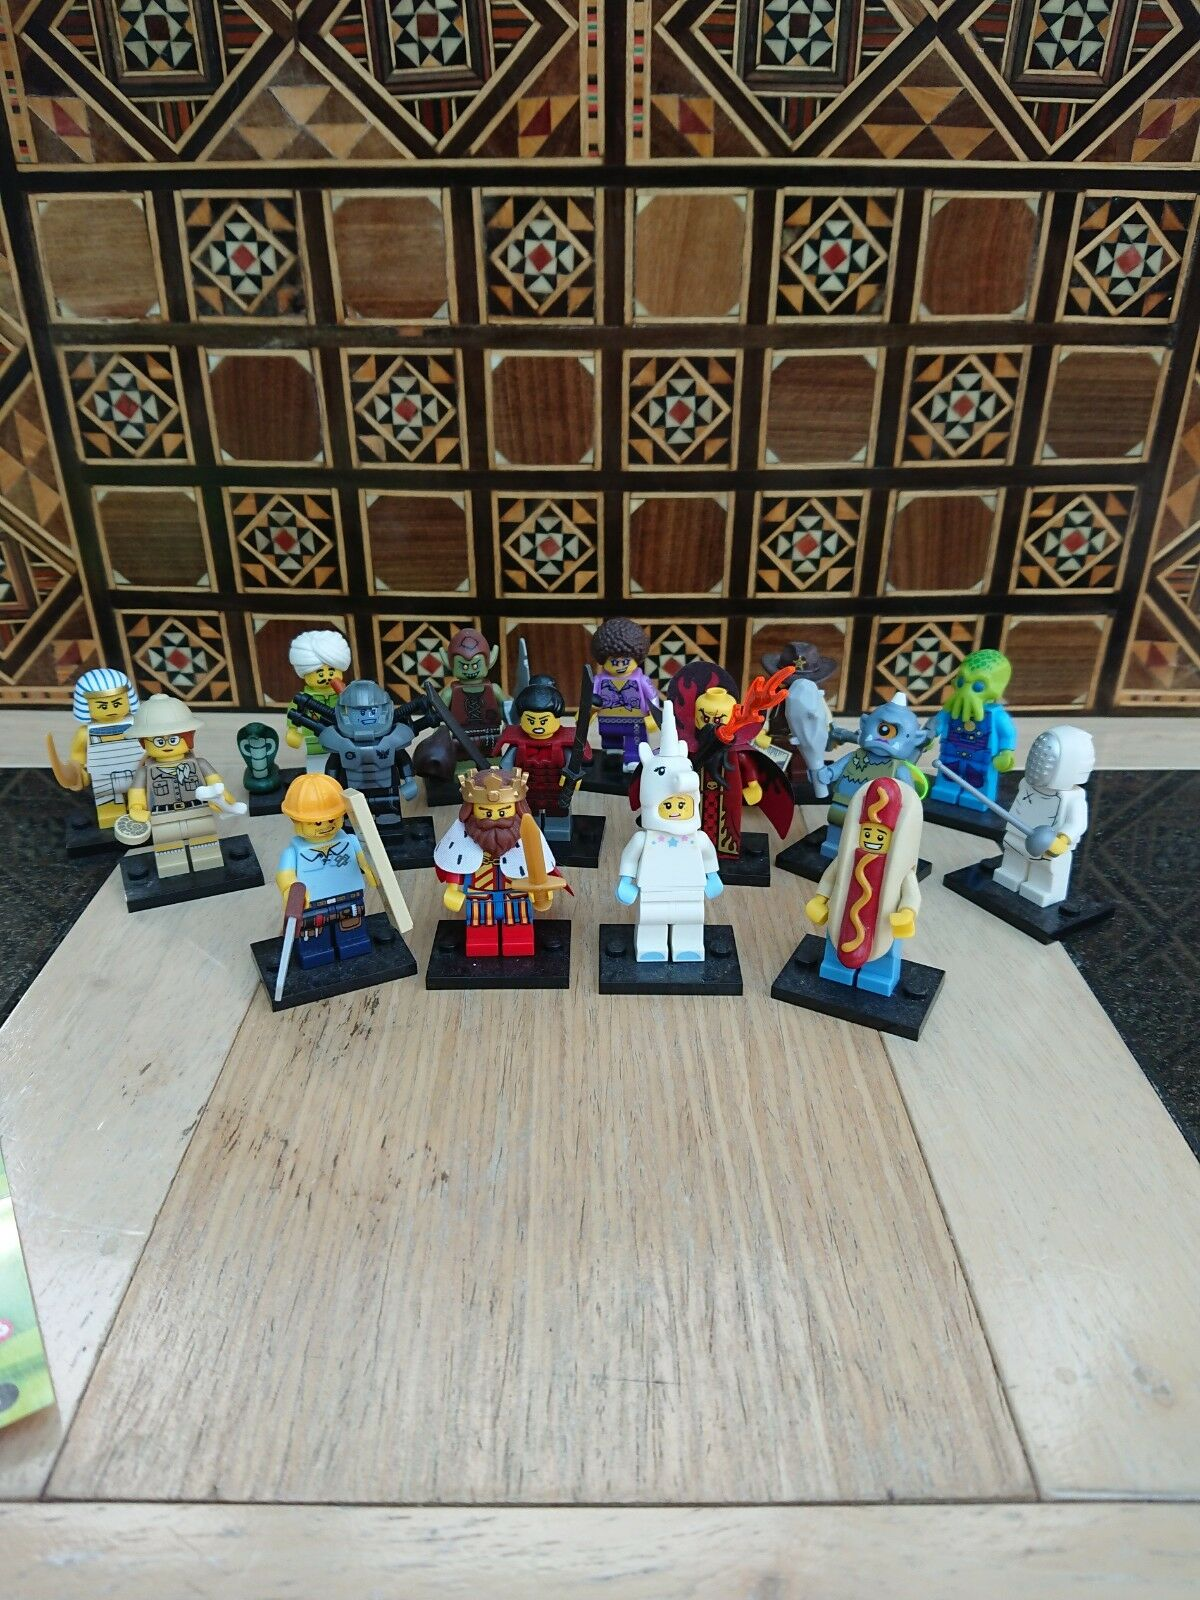 Lego Minifigures Series 13 - Full Set of 16 figures